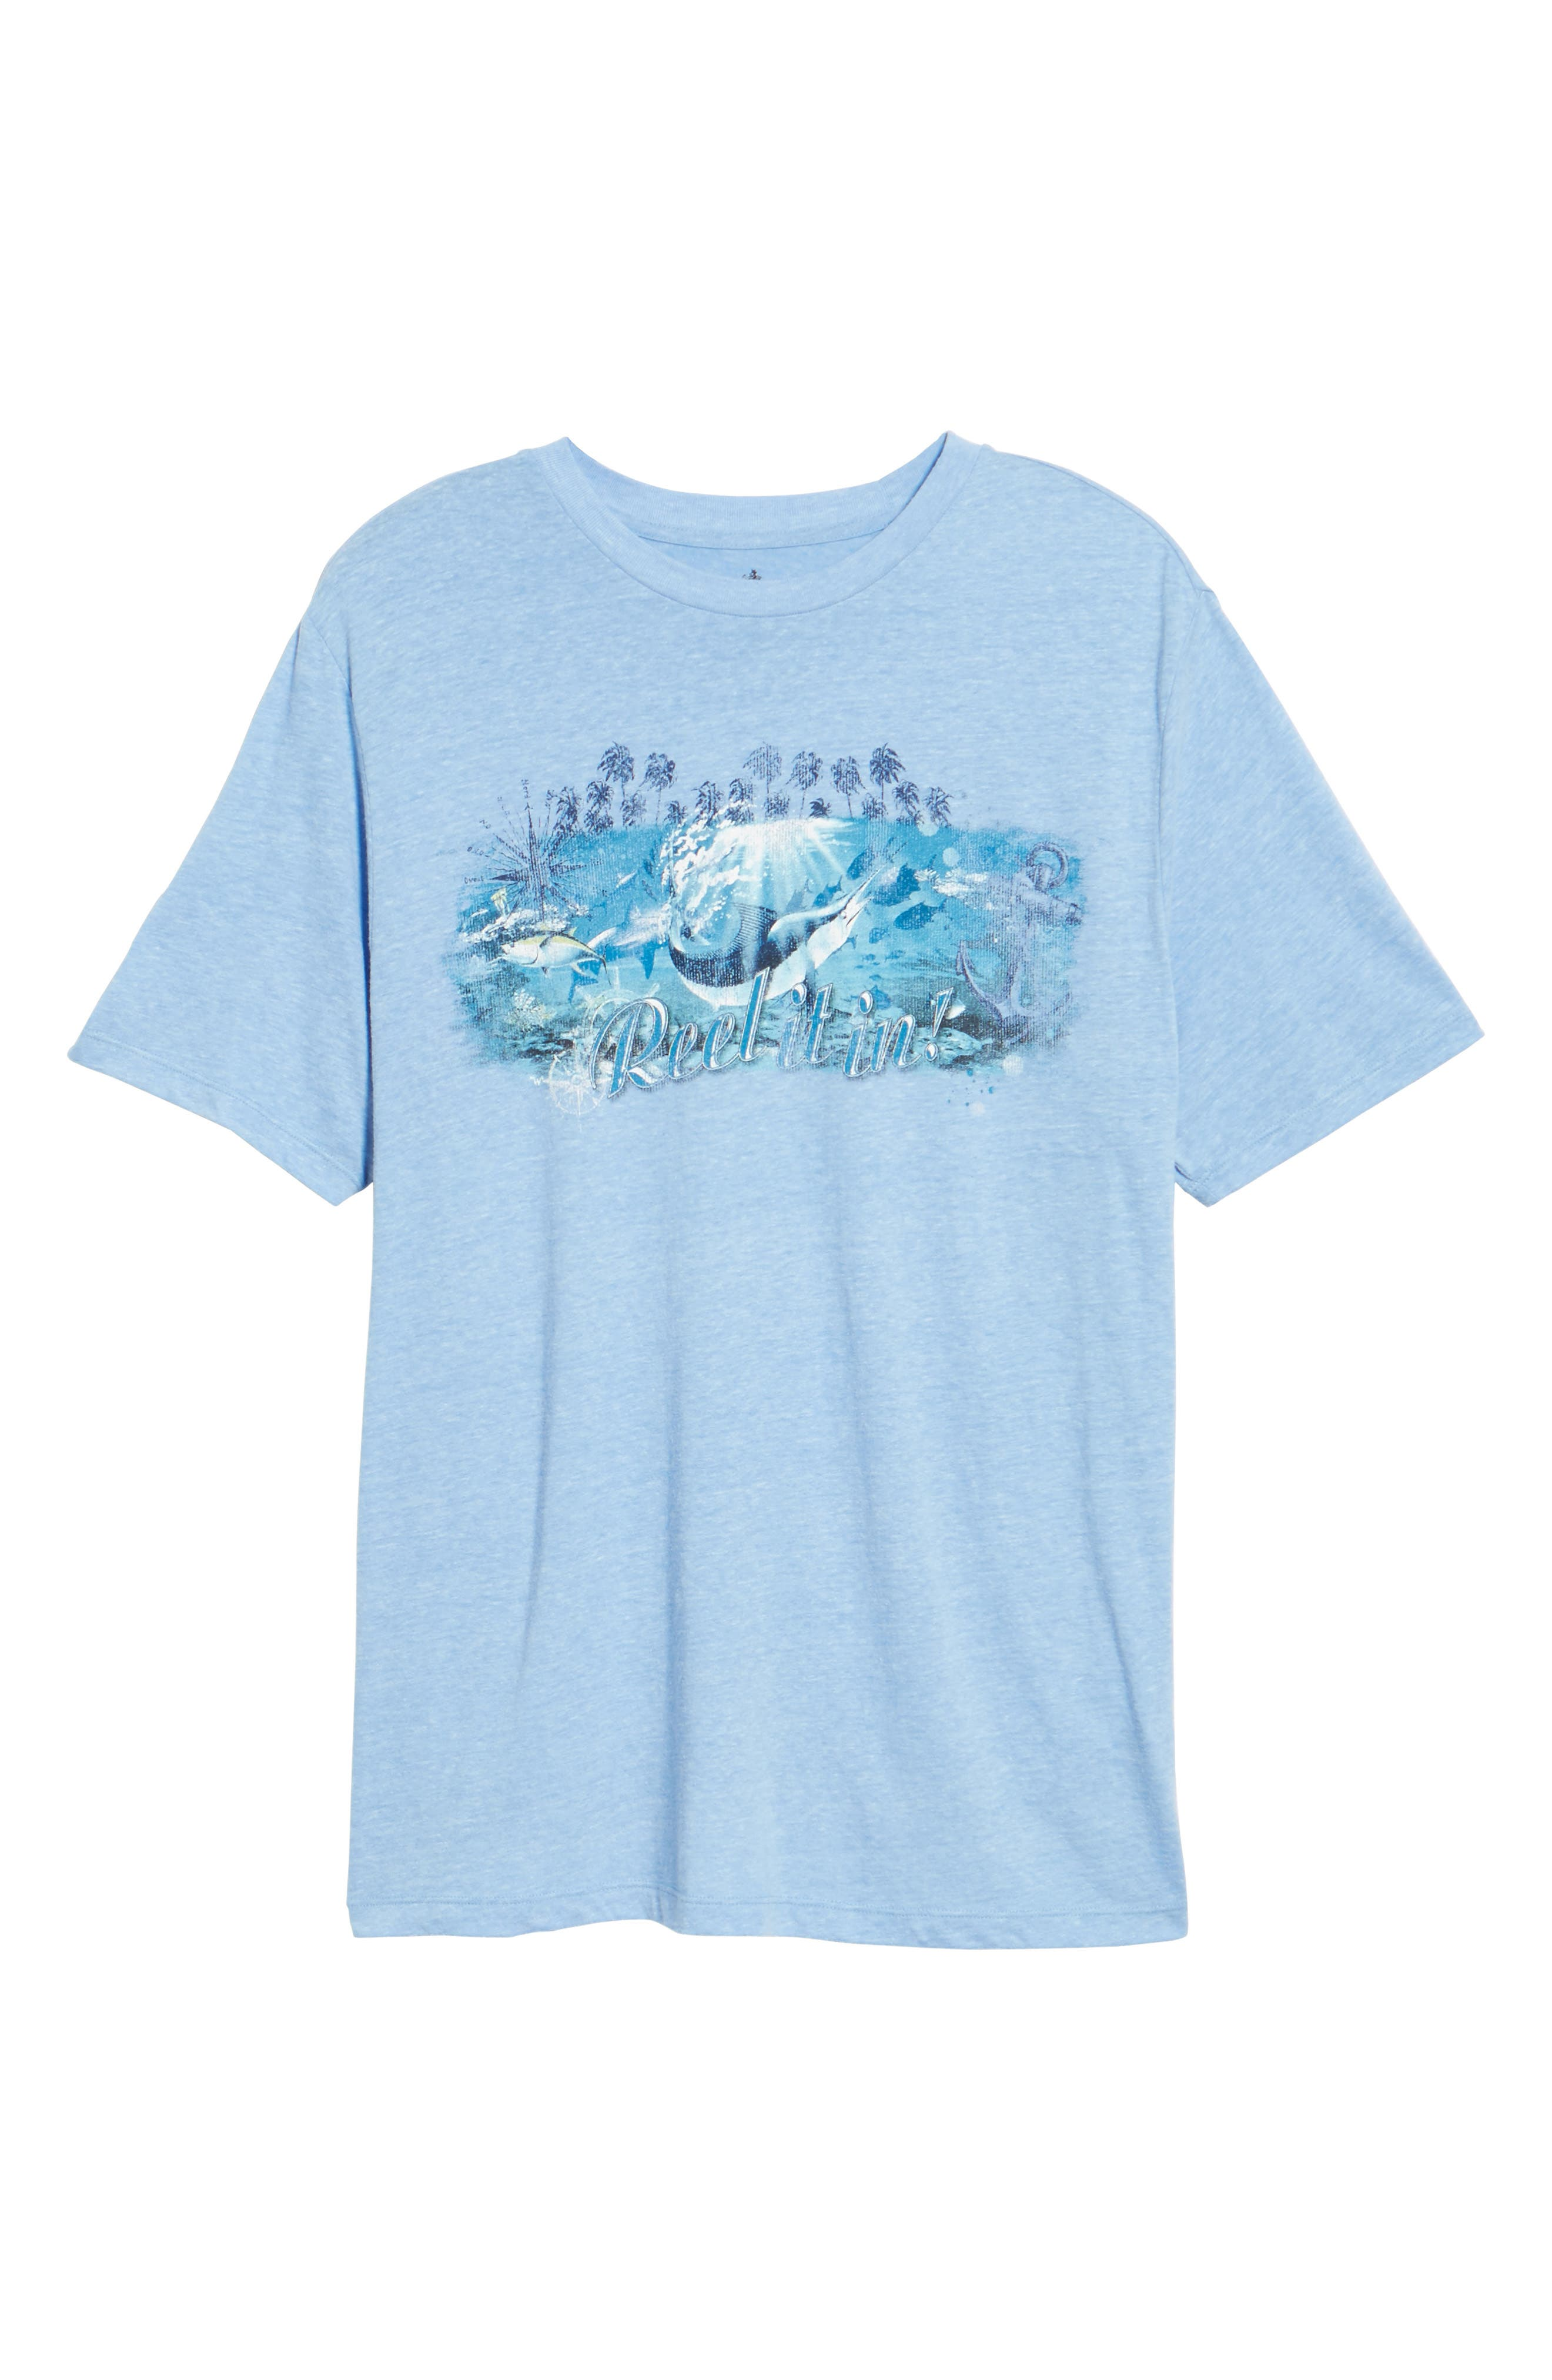 Reel Life Graphic T-Shirt,                             Alternate thumbnail 6, color,                             Dusty Blue